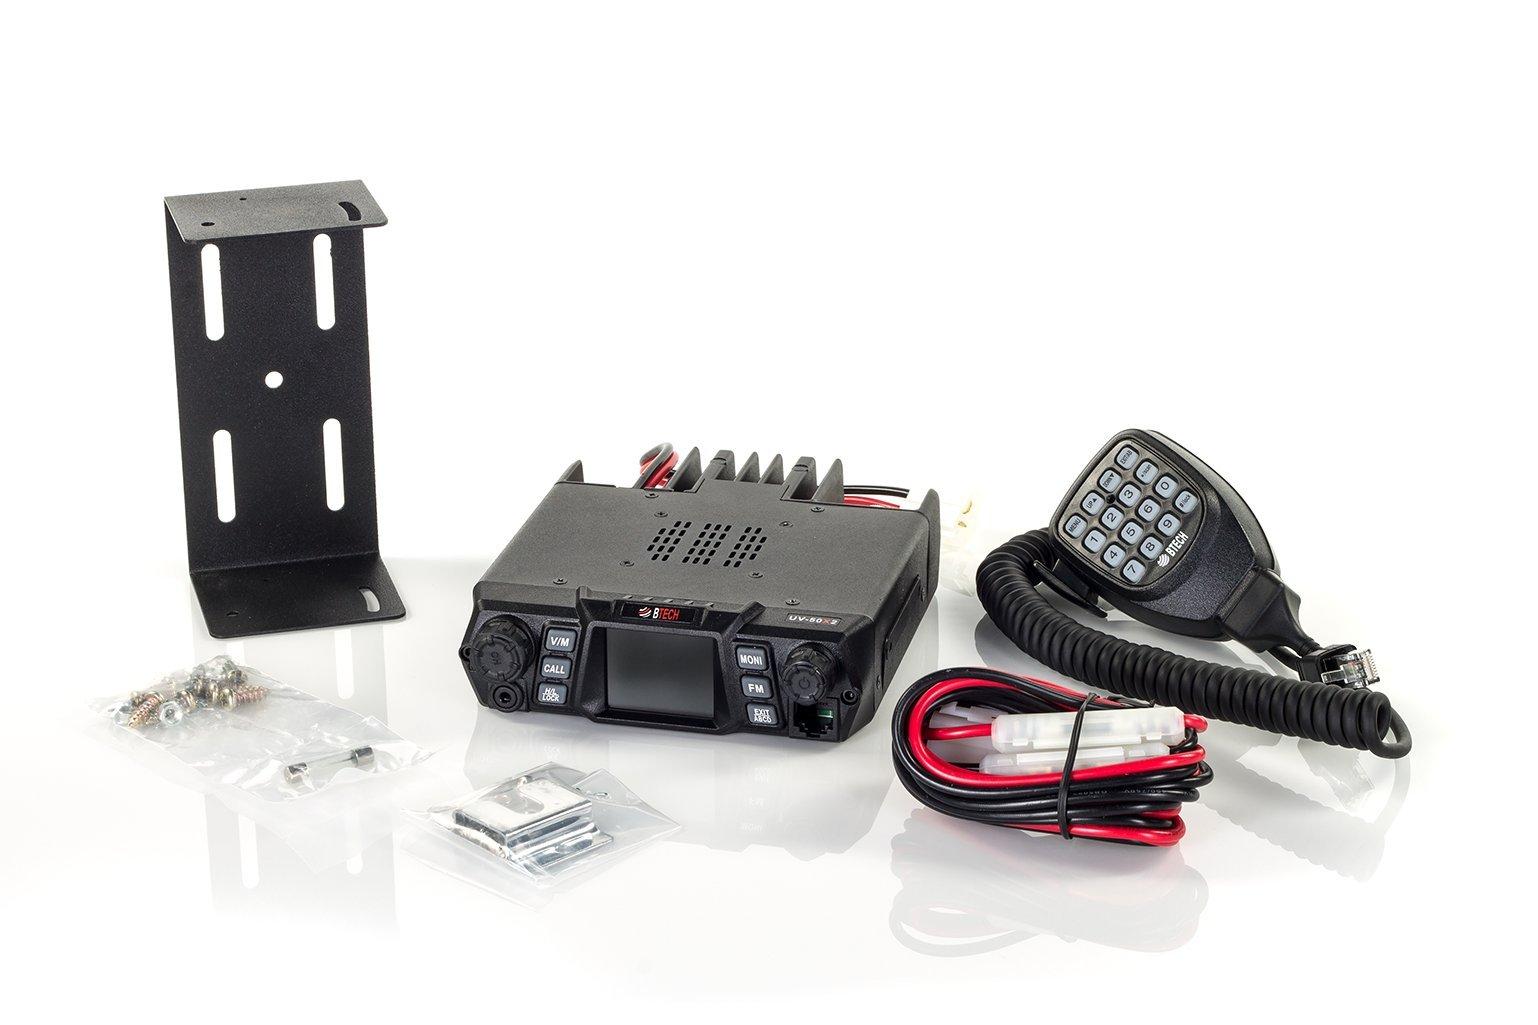 BTECH MOBILE UV-50X2 50 Watt Dual Band Base, Mobile Radio: 136-174mhz (VHF) 400-520mhz (UHF) Amateur (Ham) by BTECH (Image #4)